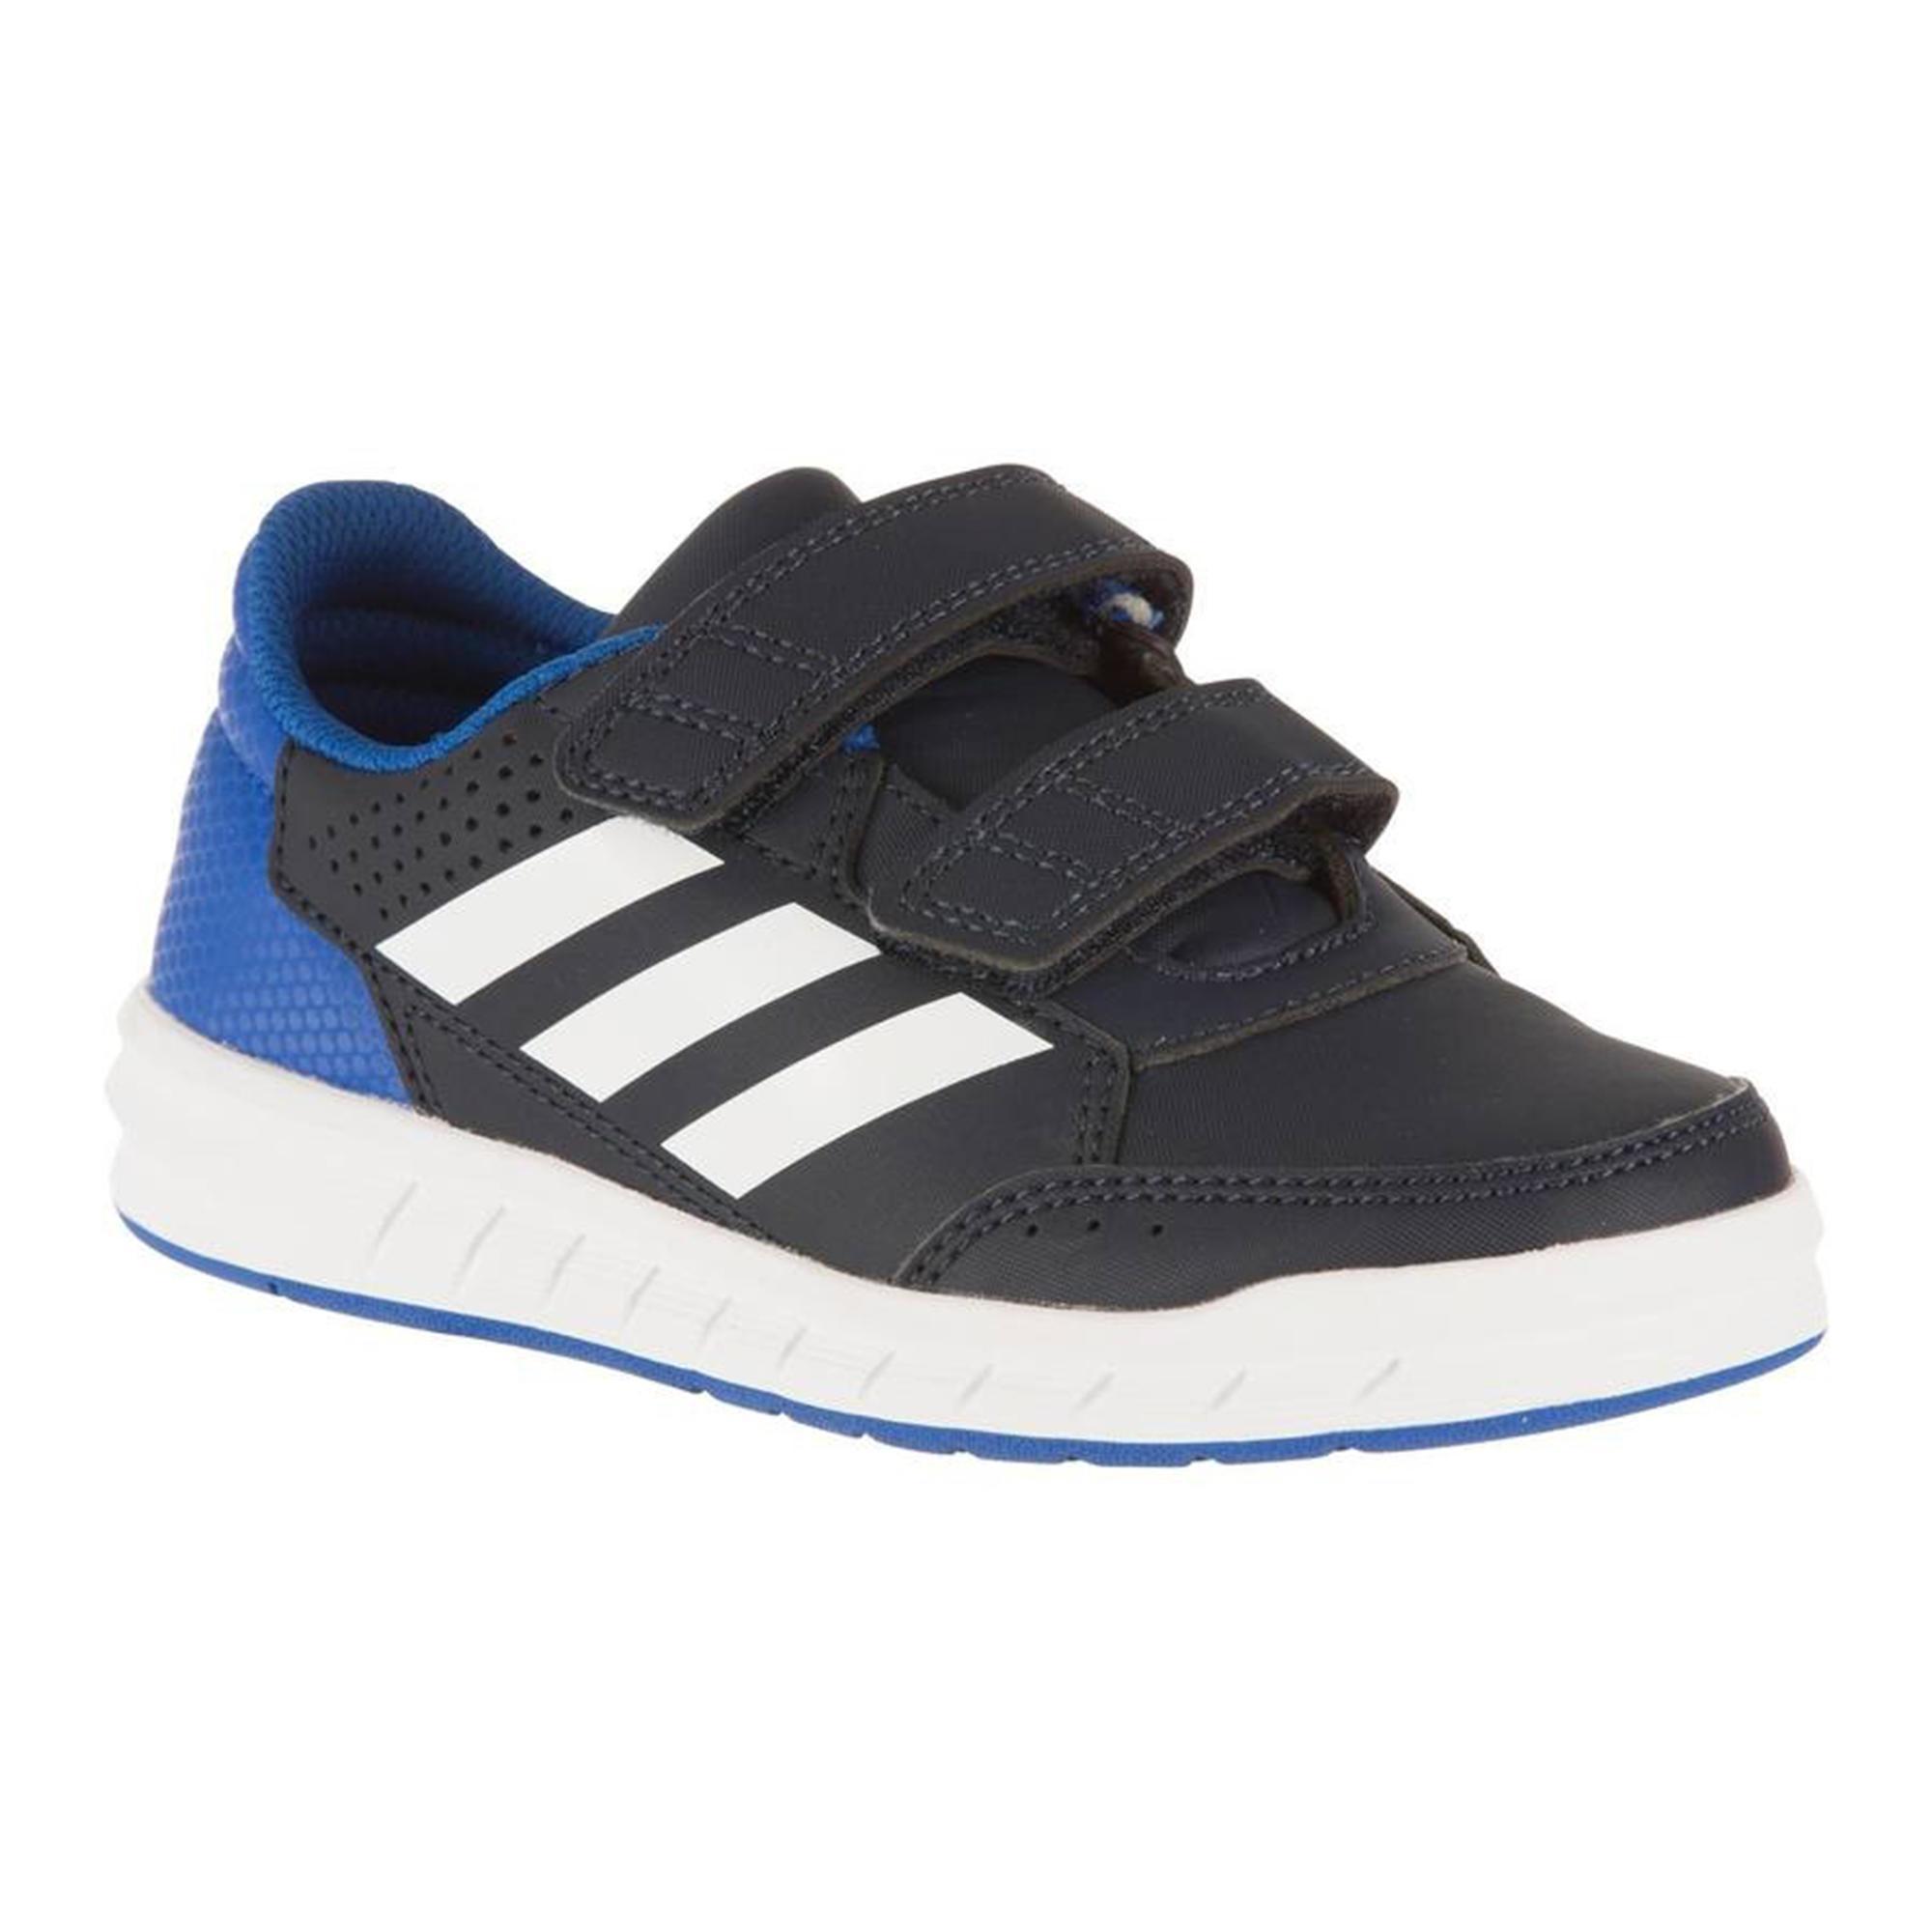 Chaussures enfant Adidas Altasport bleu